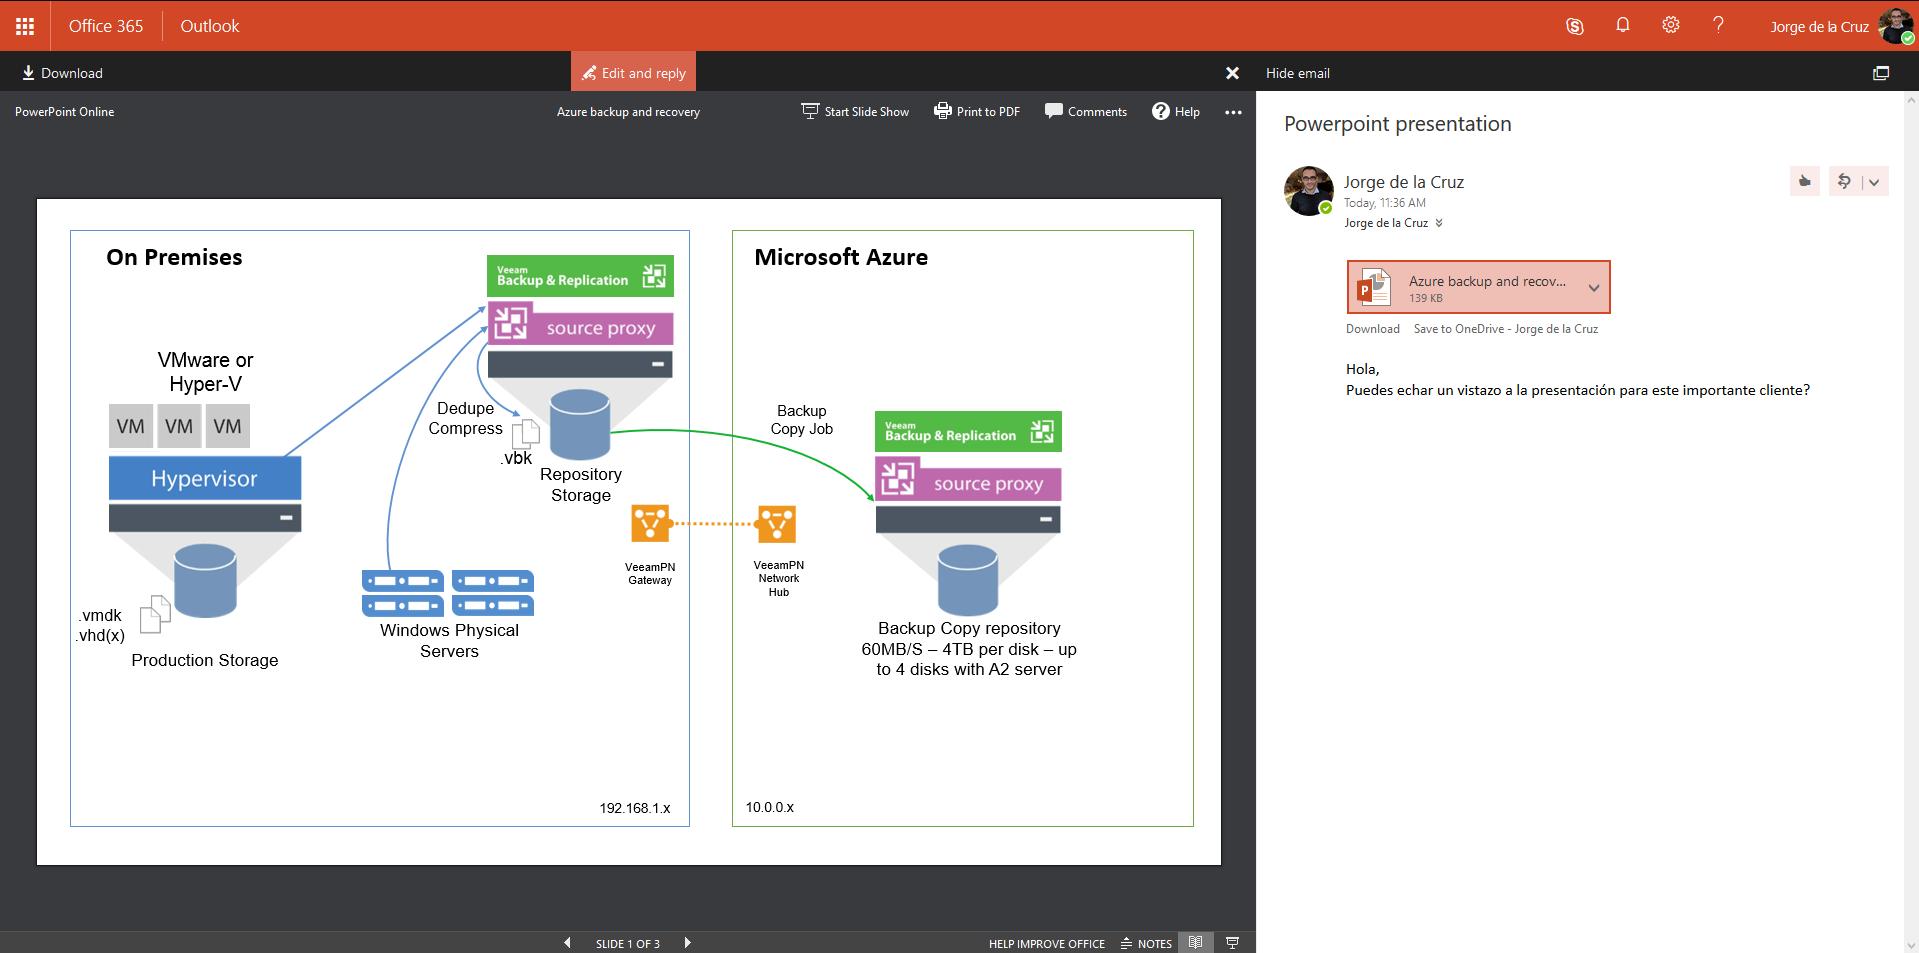 Microsoft: Seis funcionalidades de Microsoft Office 365 que mejoran